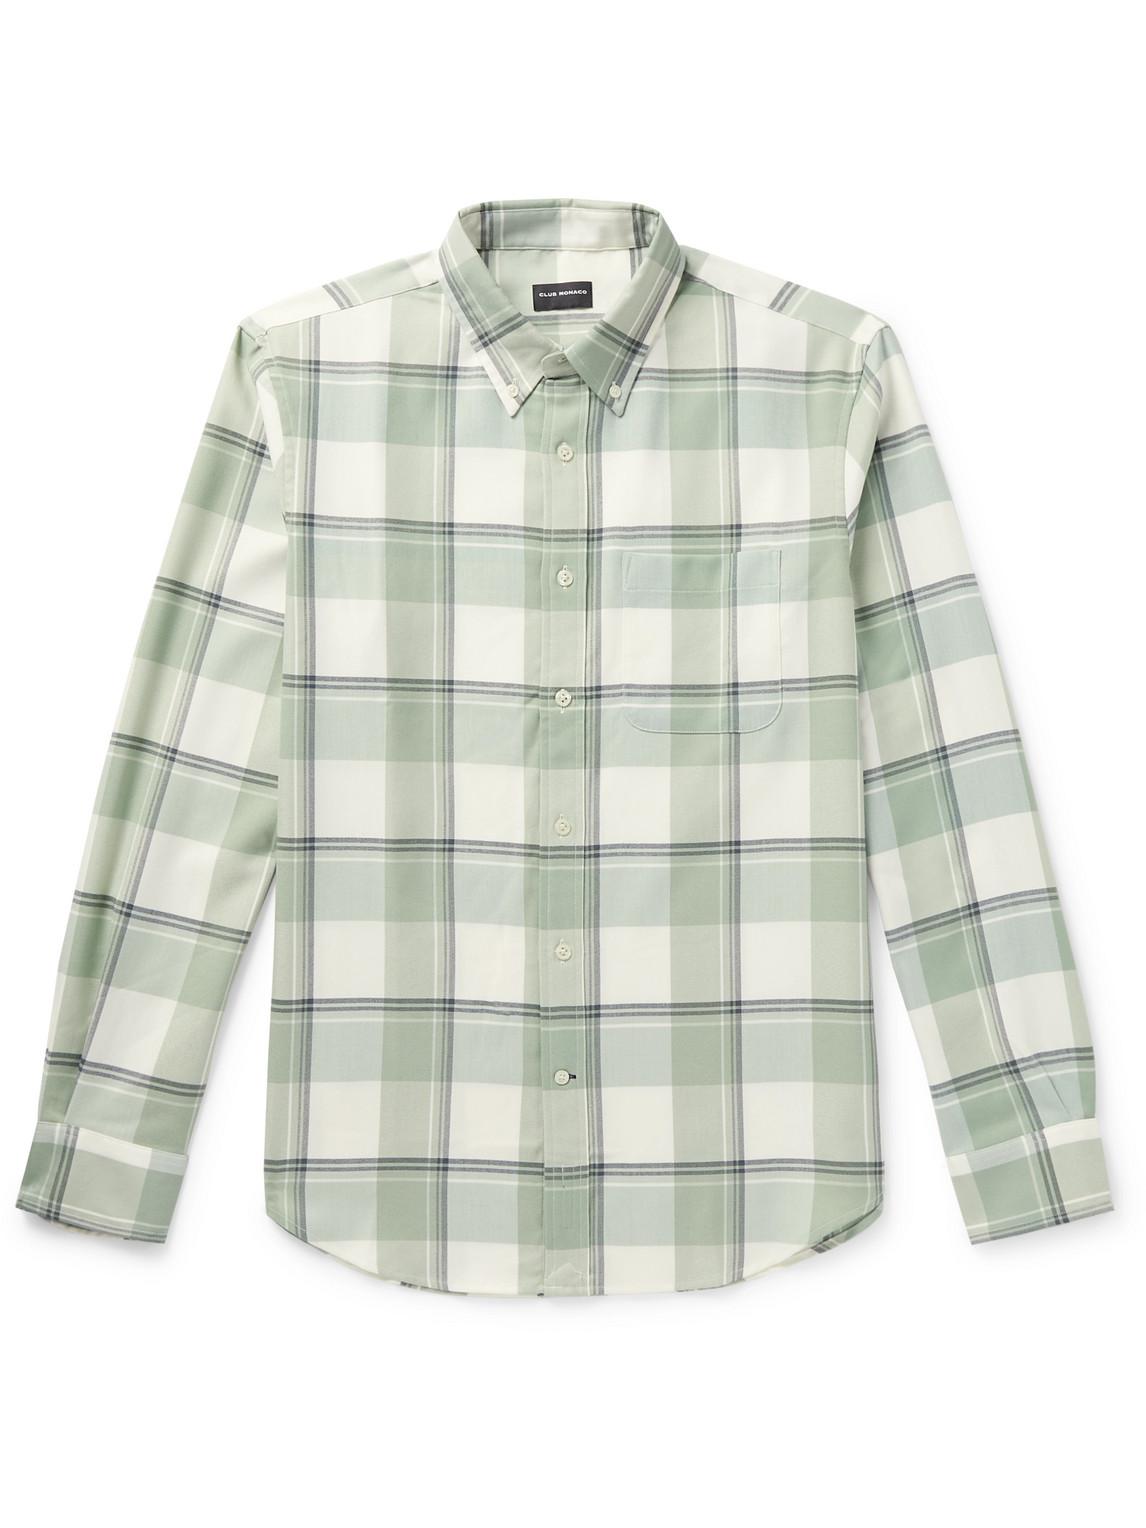 club monaco - button-down collar checked twill shirt - men - green - xs